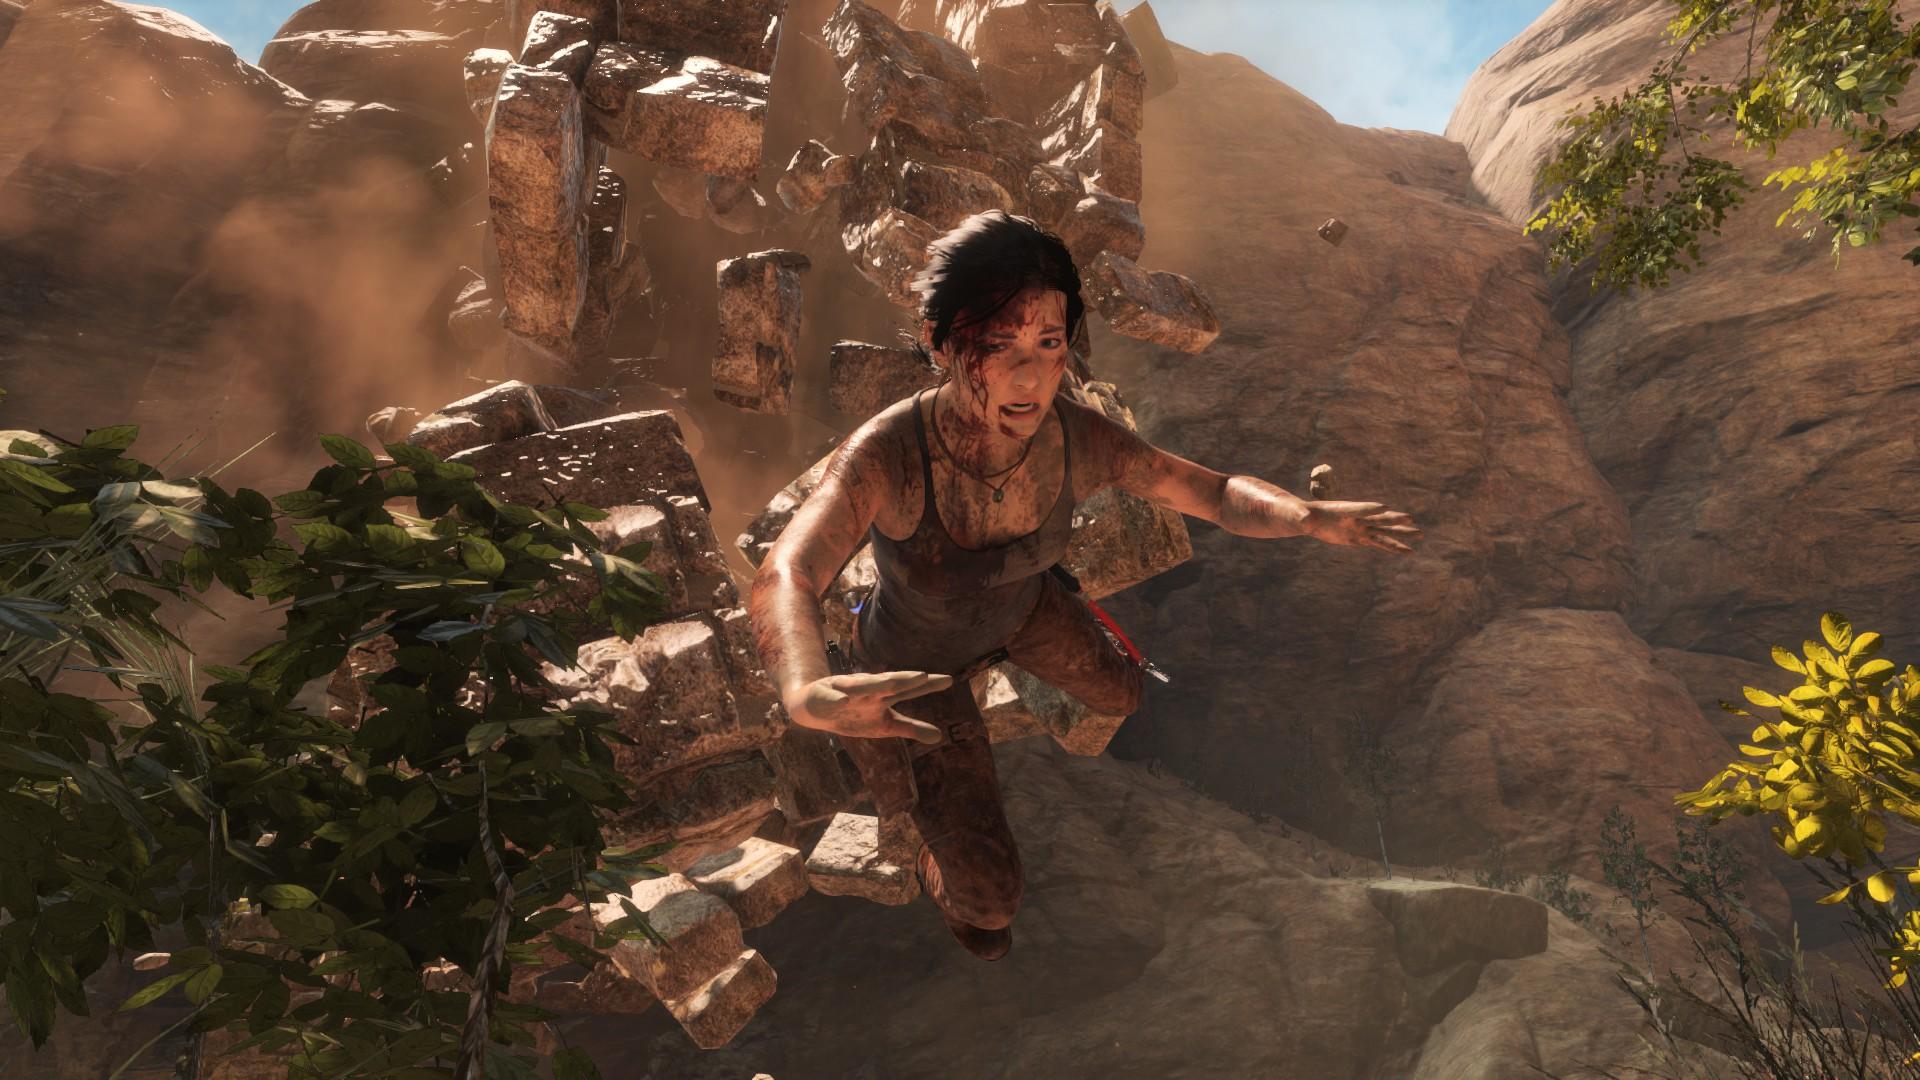 391220_screenshots_20180517225441_1.jpg - Rise of the Tomb Raider